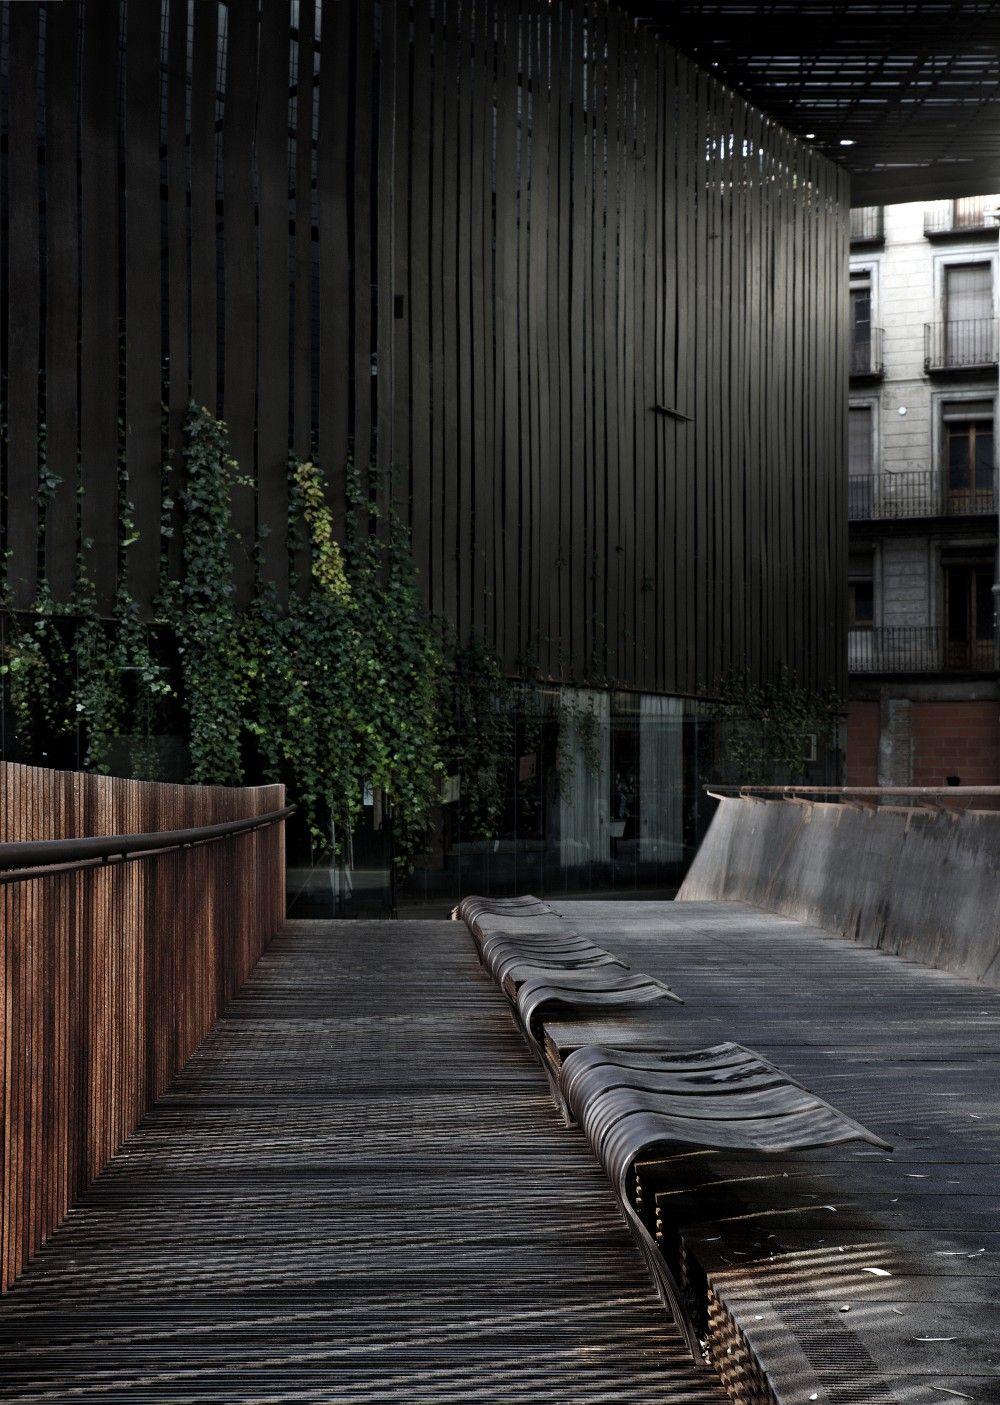 Public theatre ripoll girona spain by rcr arquitectes - Arquitectura girona ...